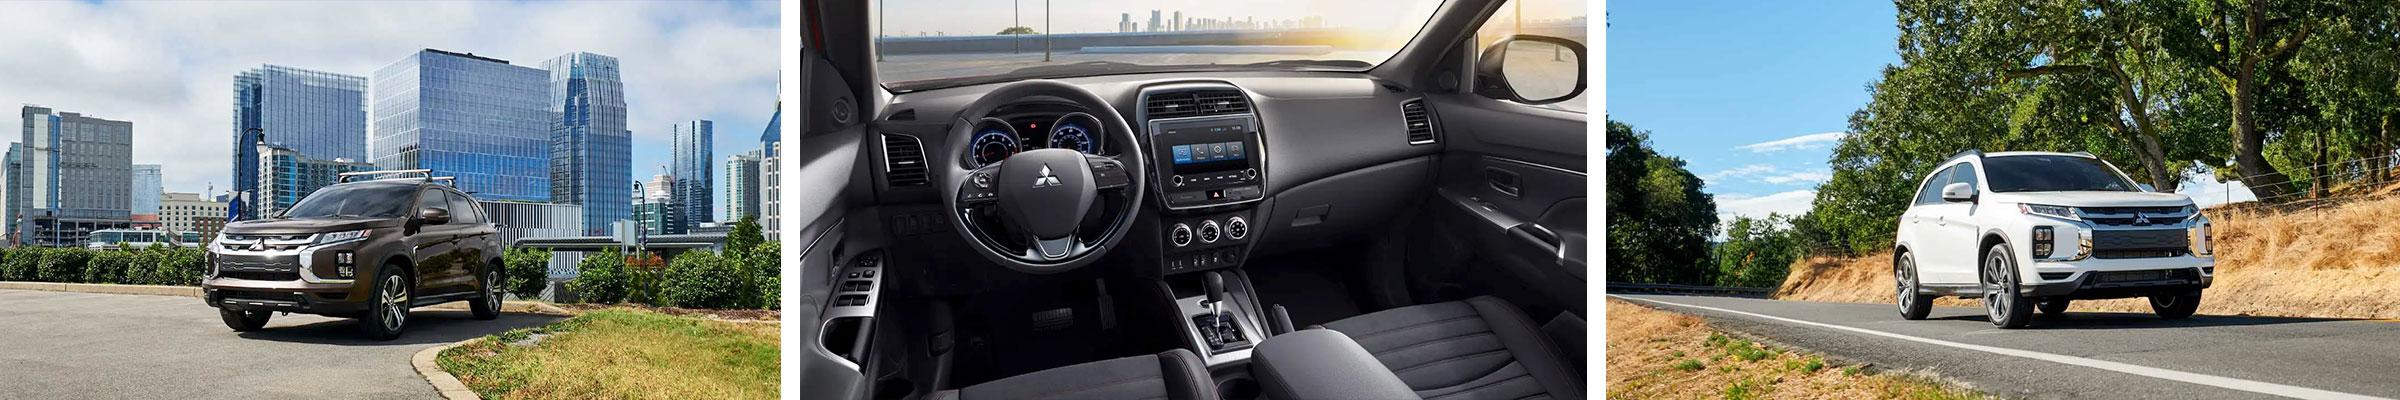 2021 Mitsubishi Outlander Sport For Sale in Wilmington, NC